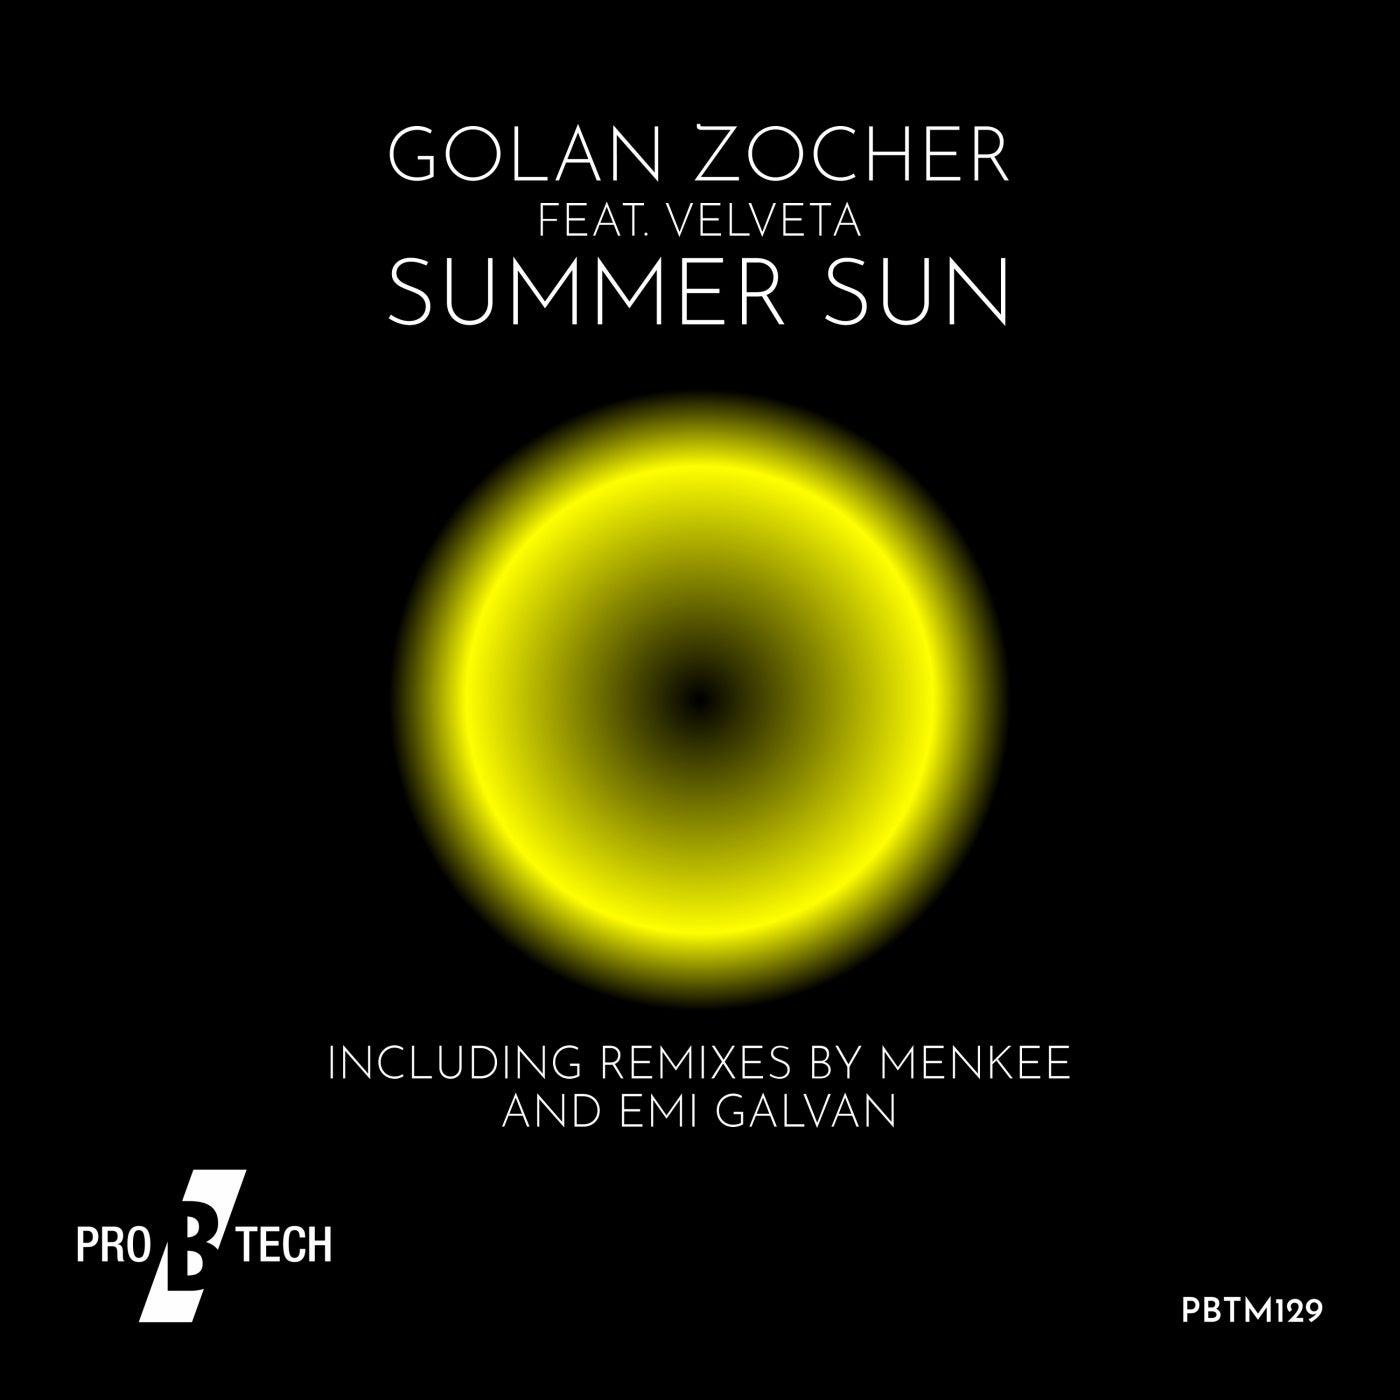 Summer Sun (Emi Galvan Remix)